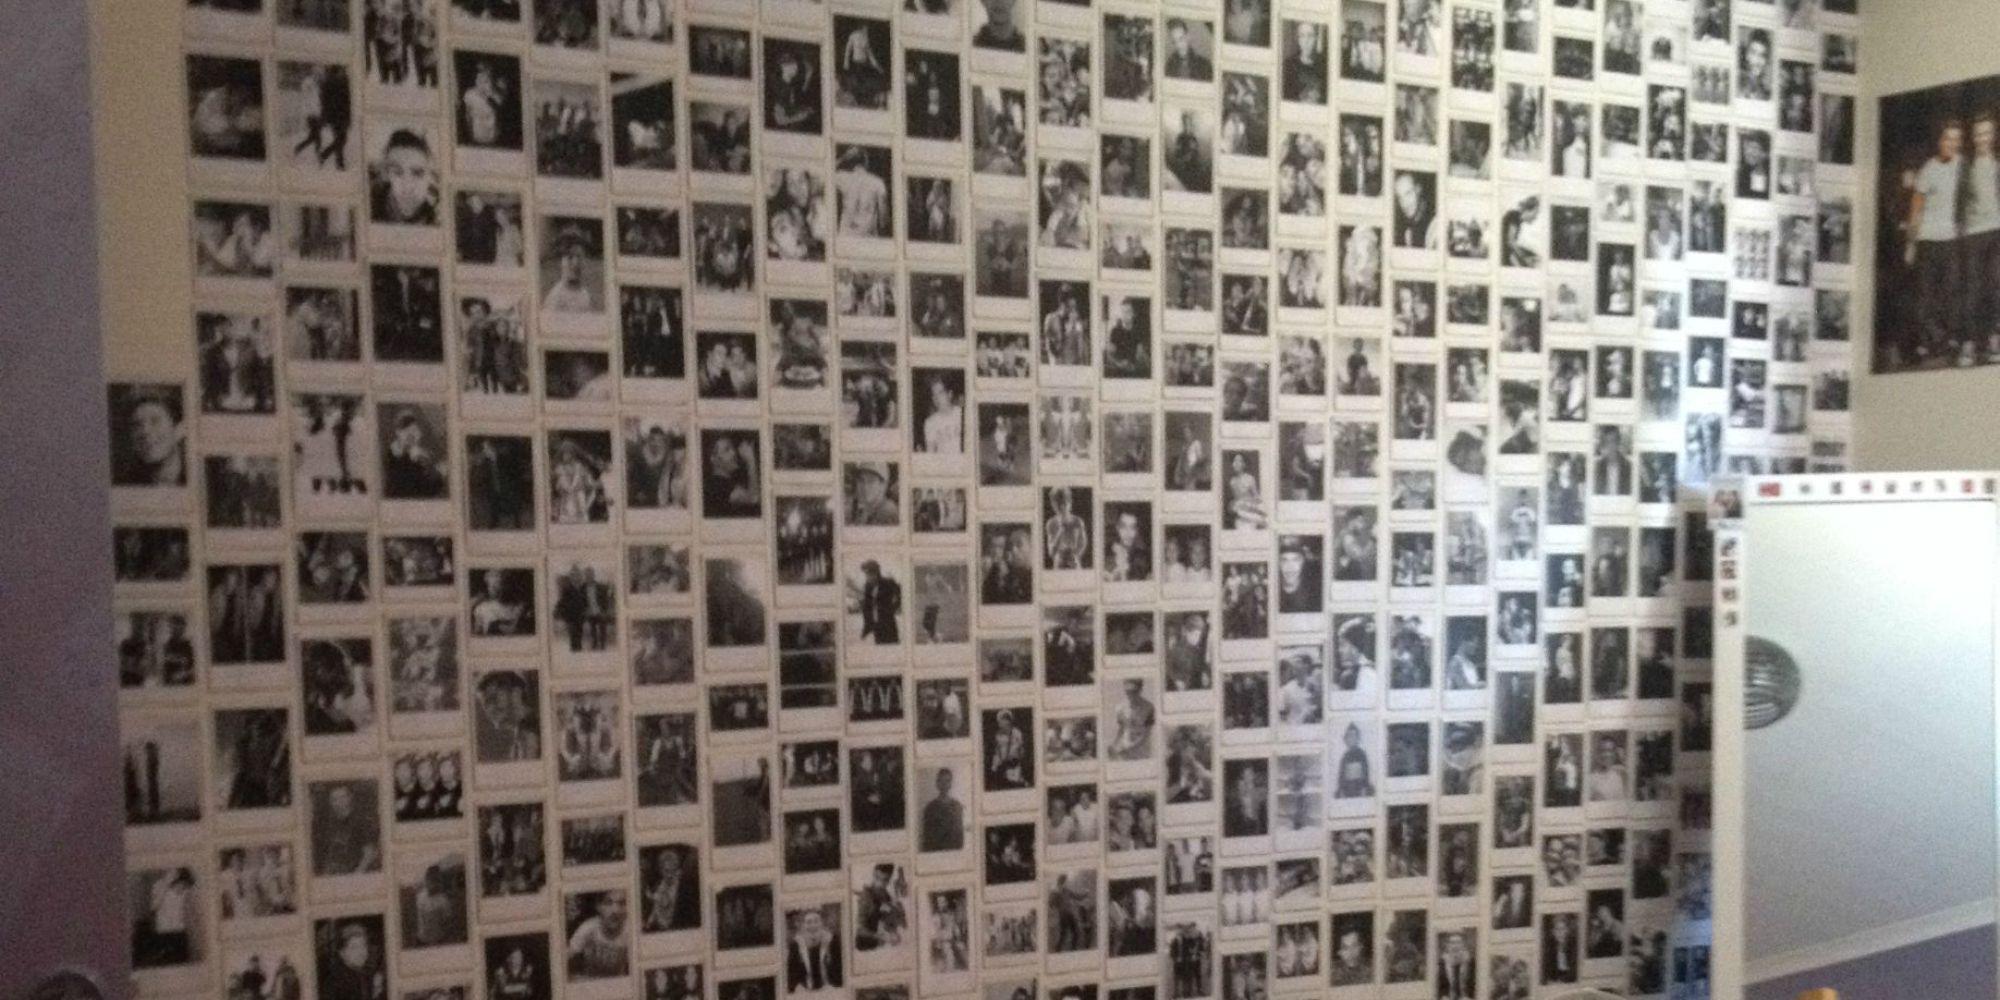 Diy room decor ideas tumblr - One Direction Room Decorating Ideas O One Direction Wall Facebook Jpg